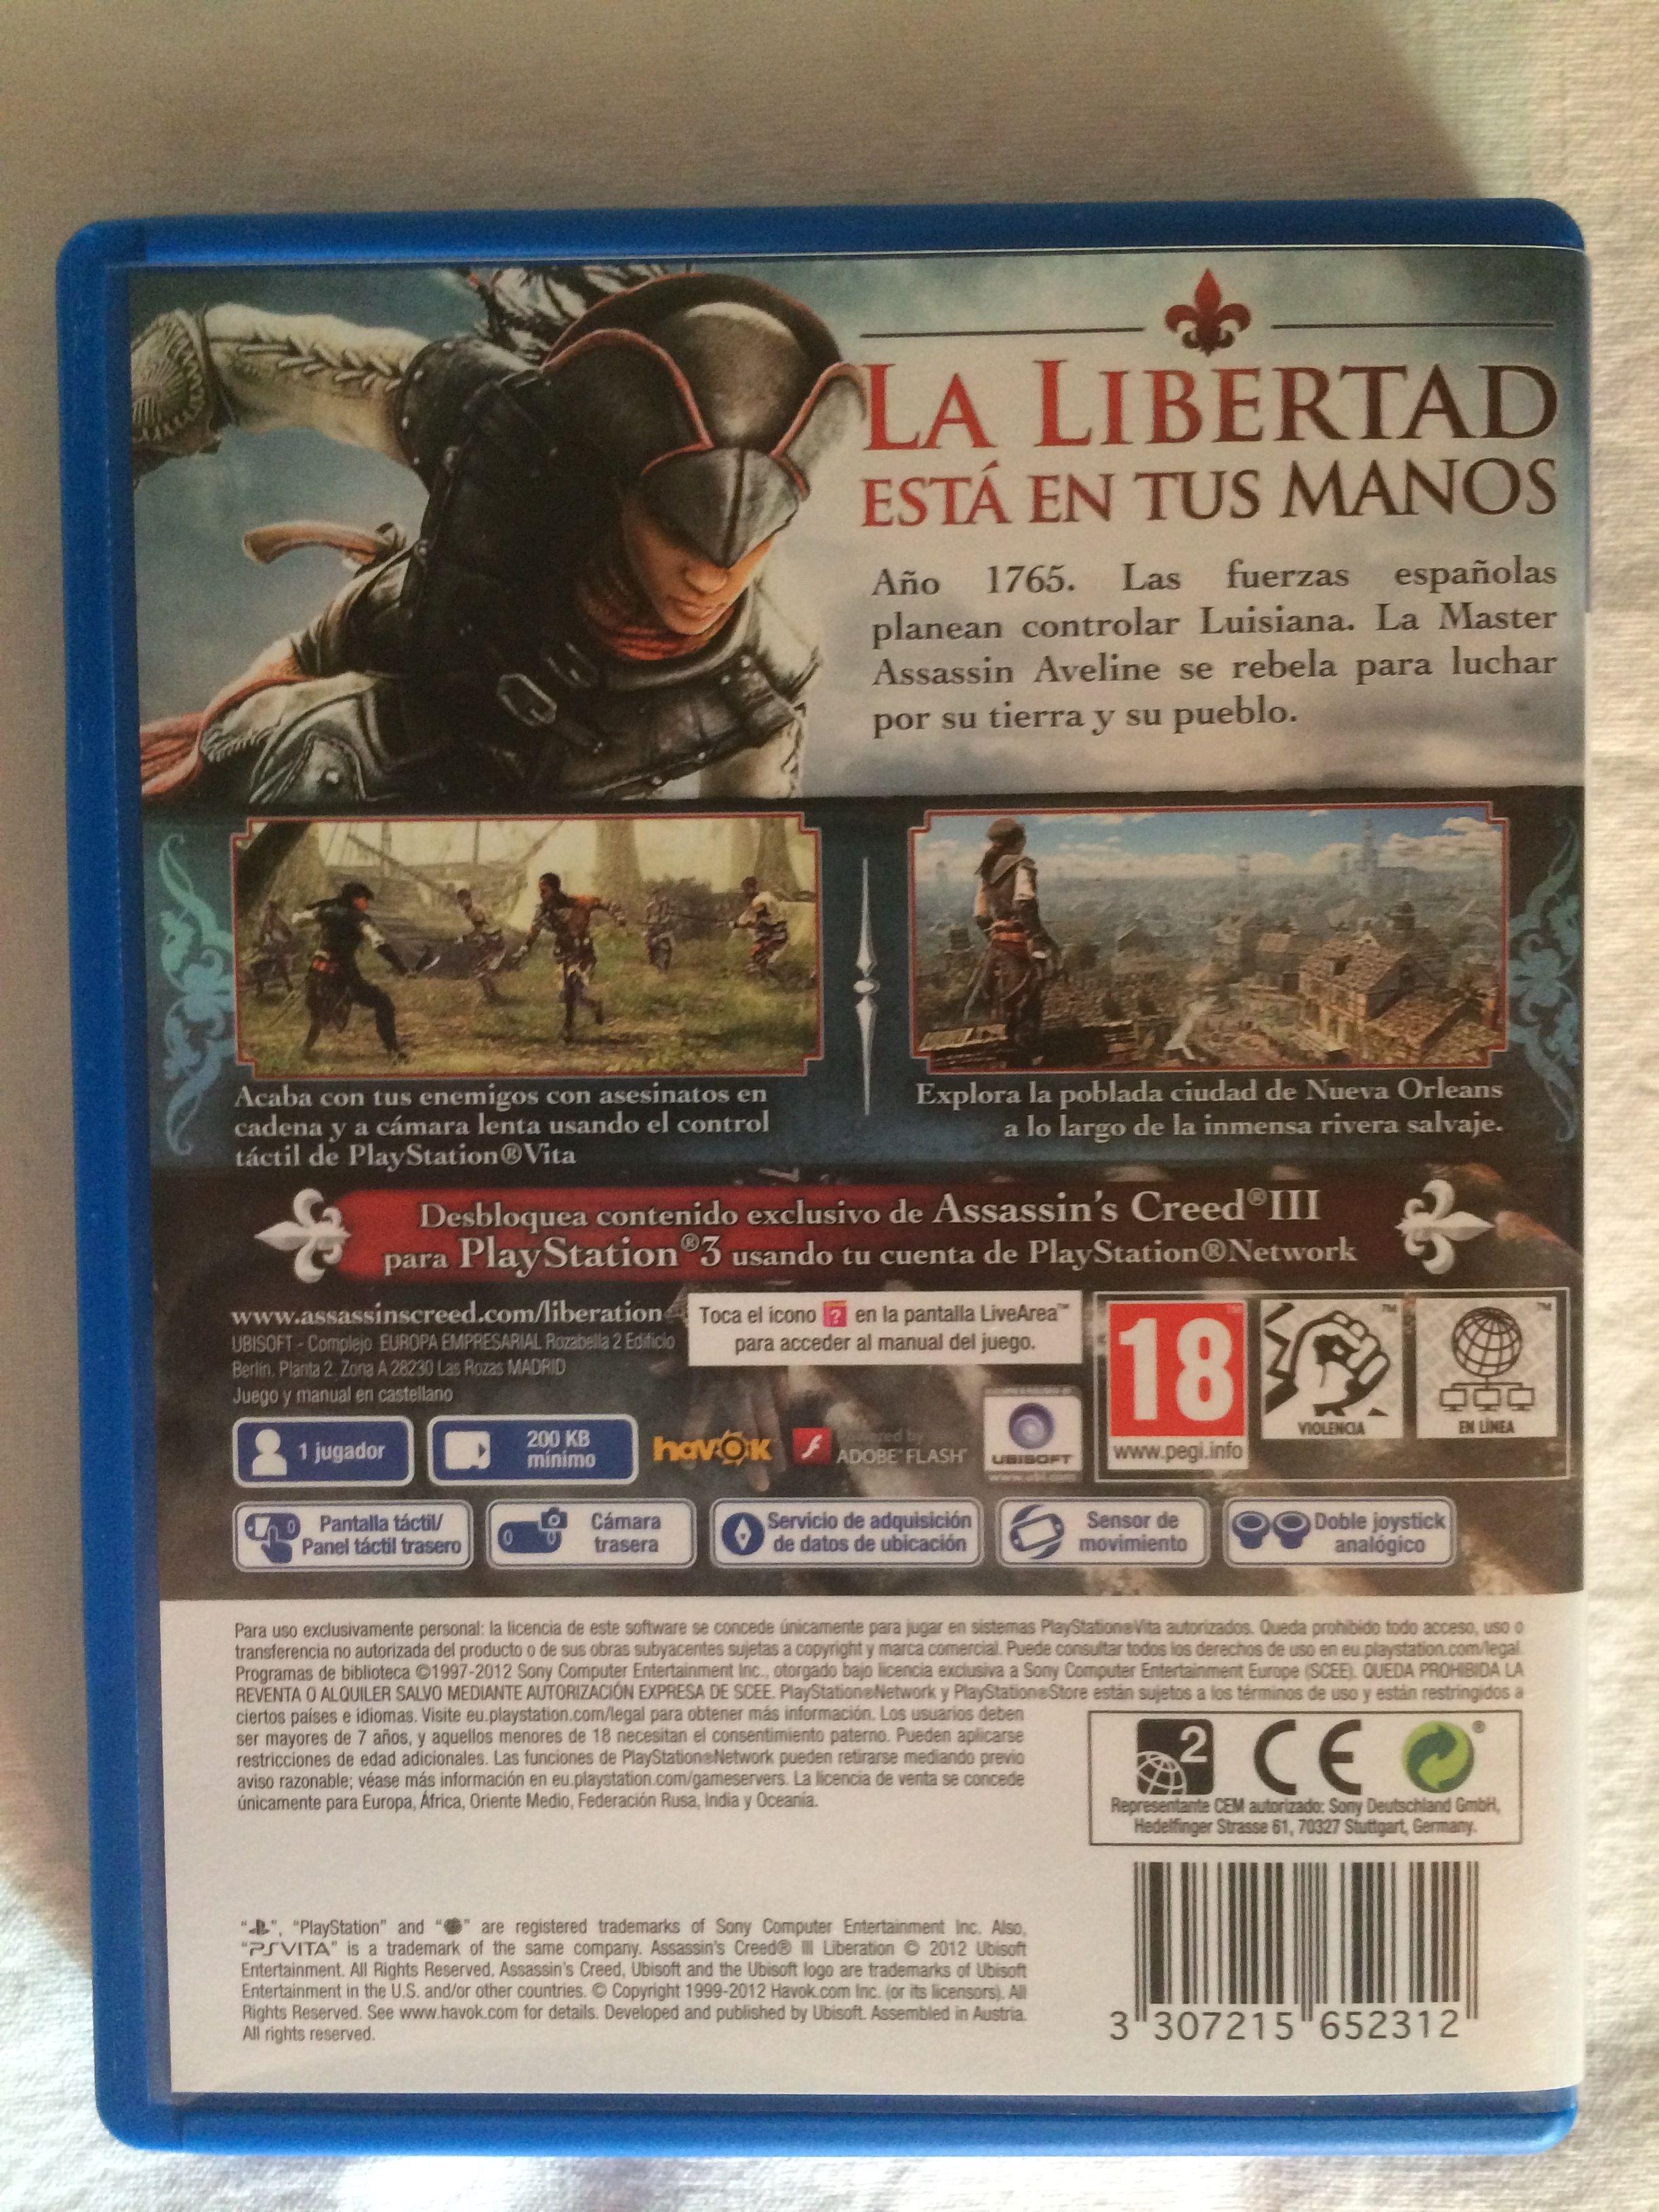 Assassins Creed Iii Liberation Game Behind Playstation Network 200